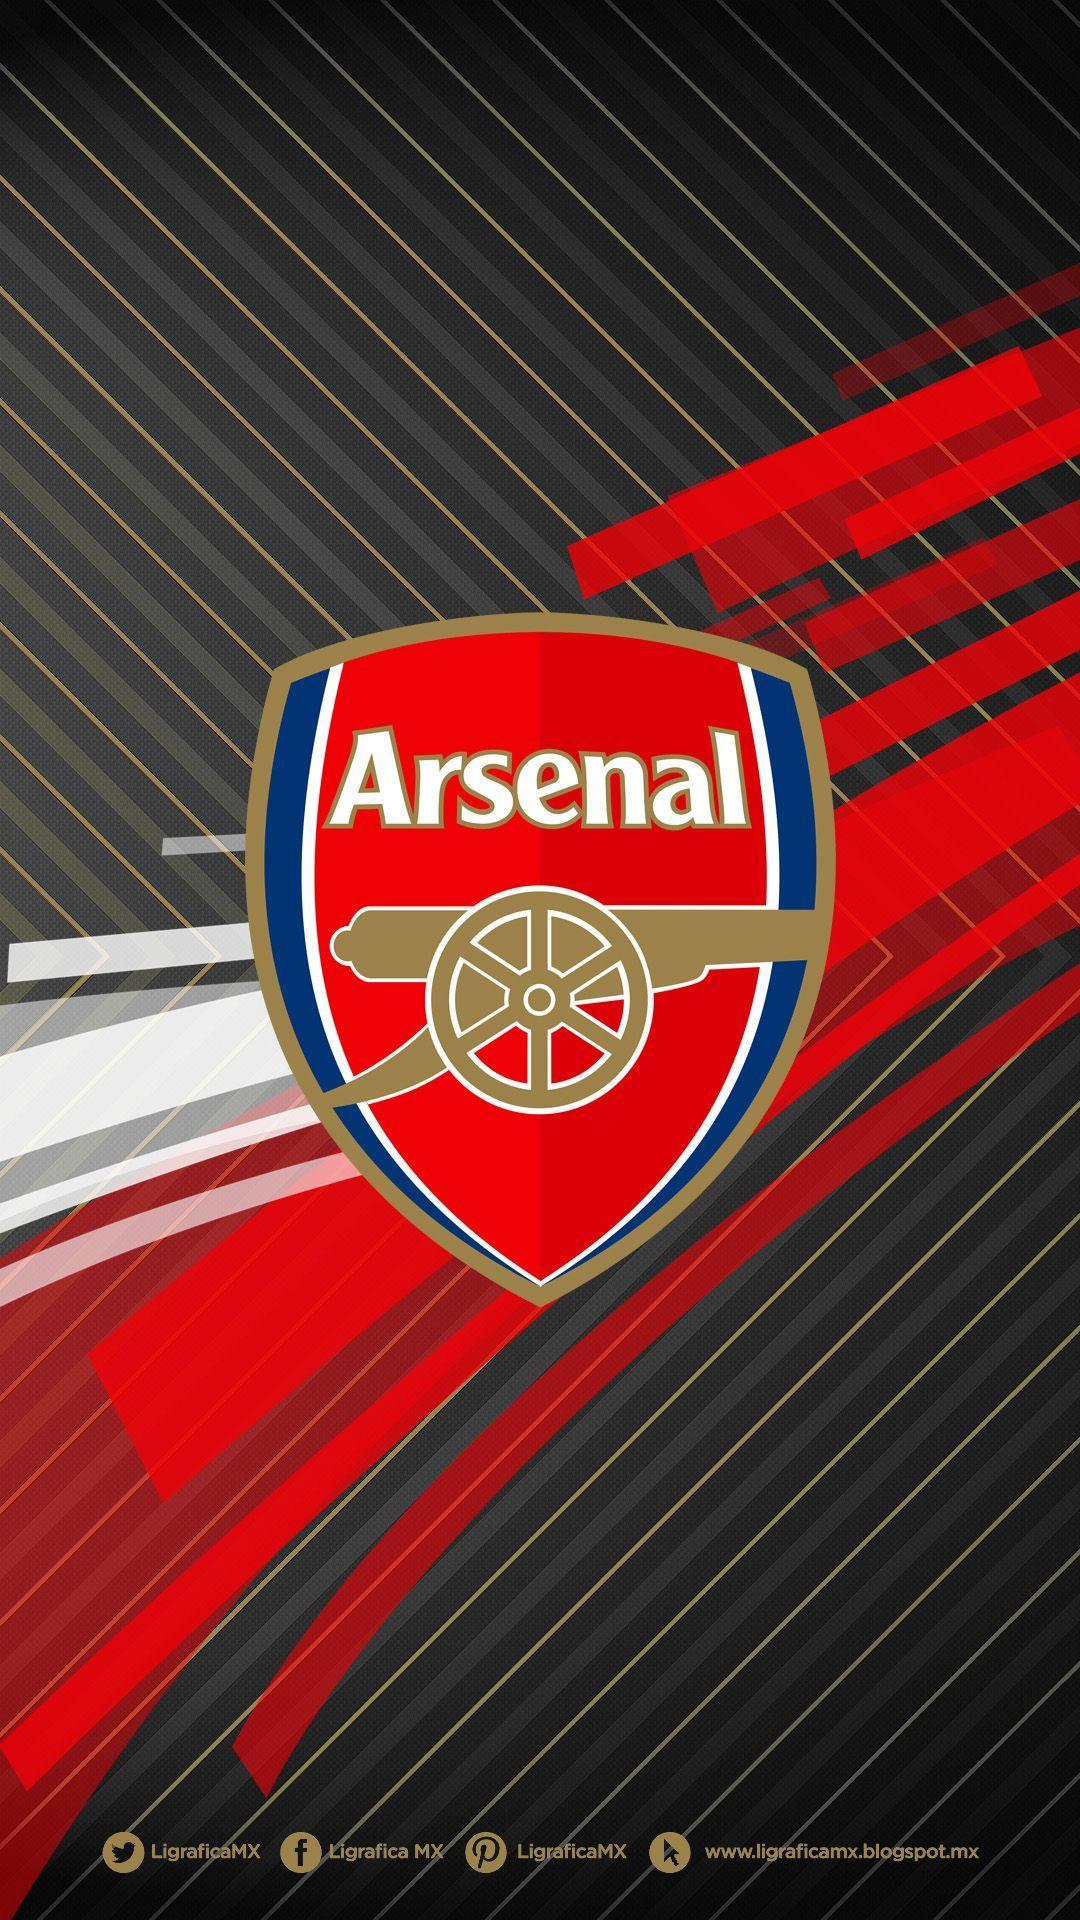 Wallpaper | Arsenal | Pinterest | Arsenal, Wallpaper and Arsenal FC